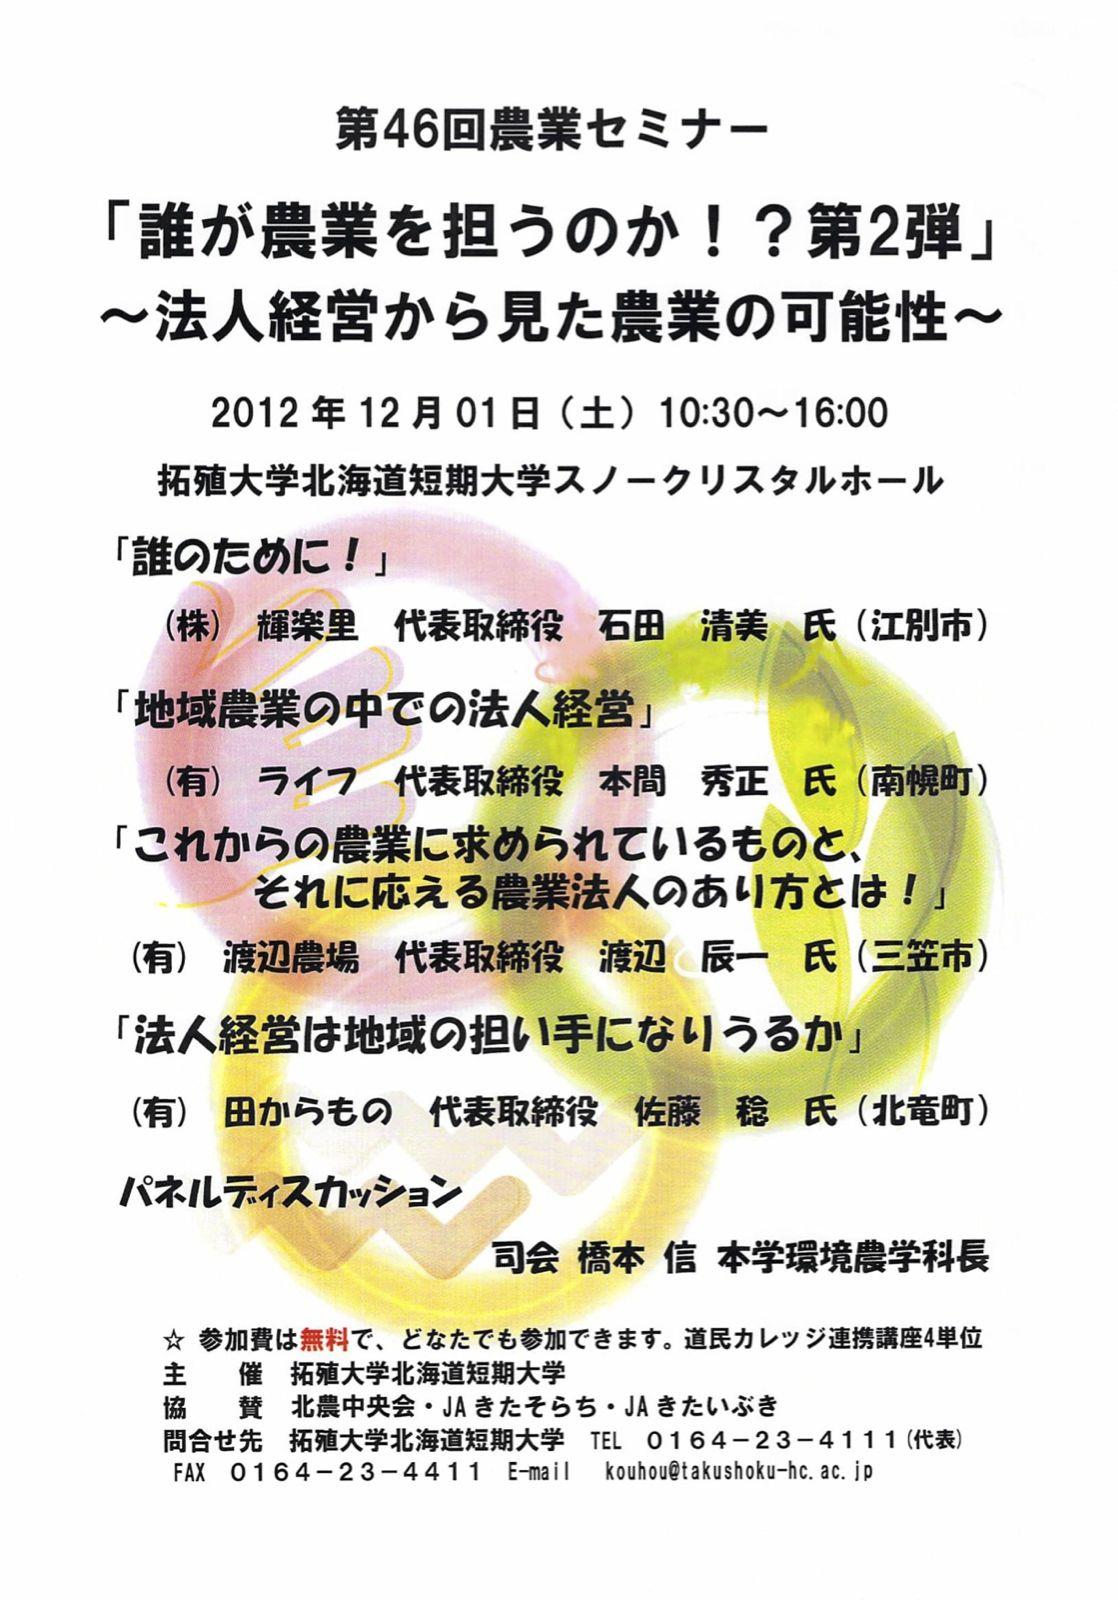 「第46回農業セミナー」2012年12月1日@拓殖大学北海道短期大学(深川市)